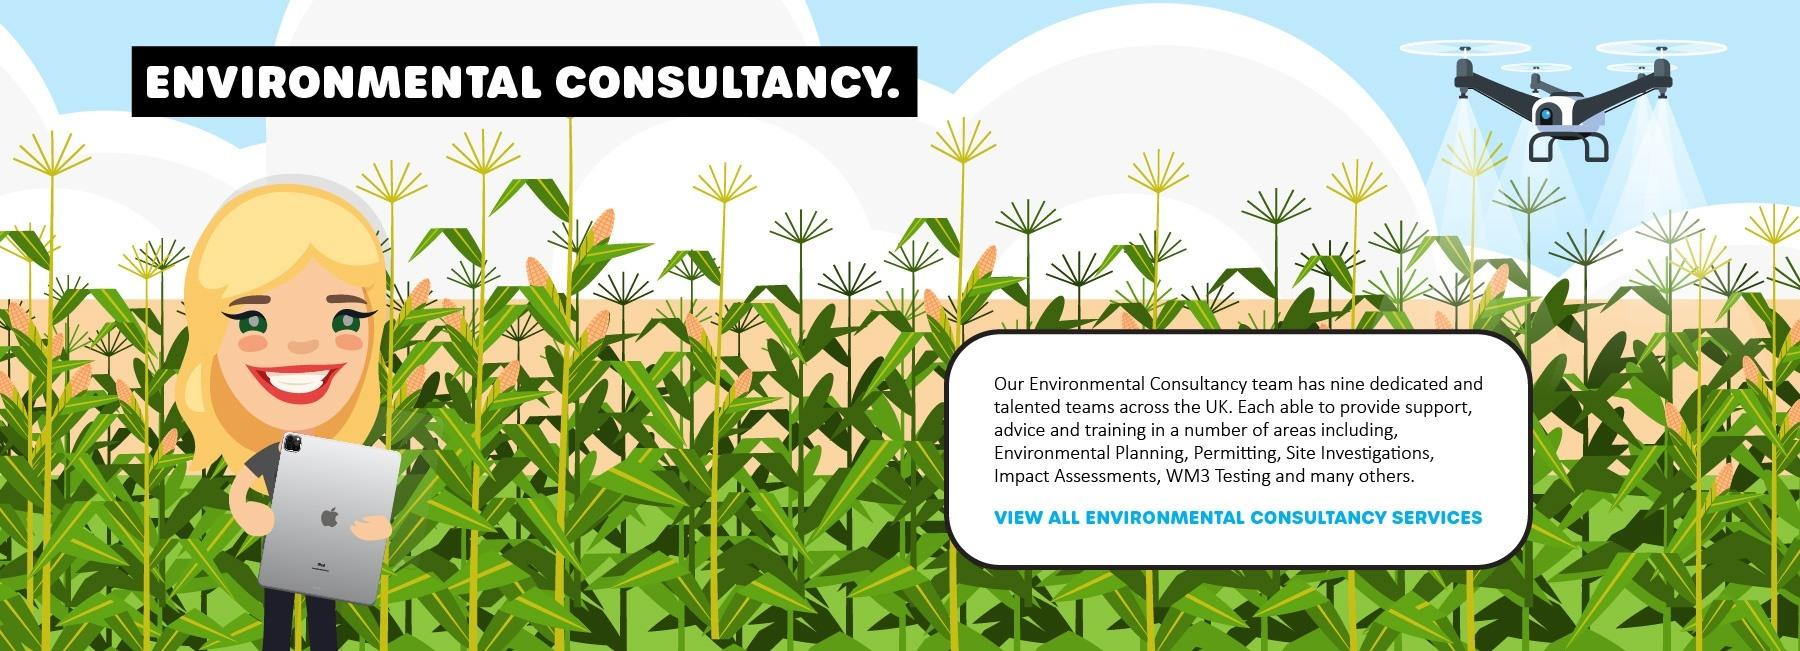 ECL Environmental Consultancy Banner